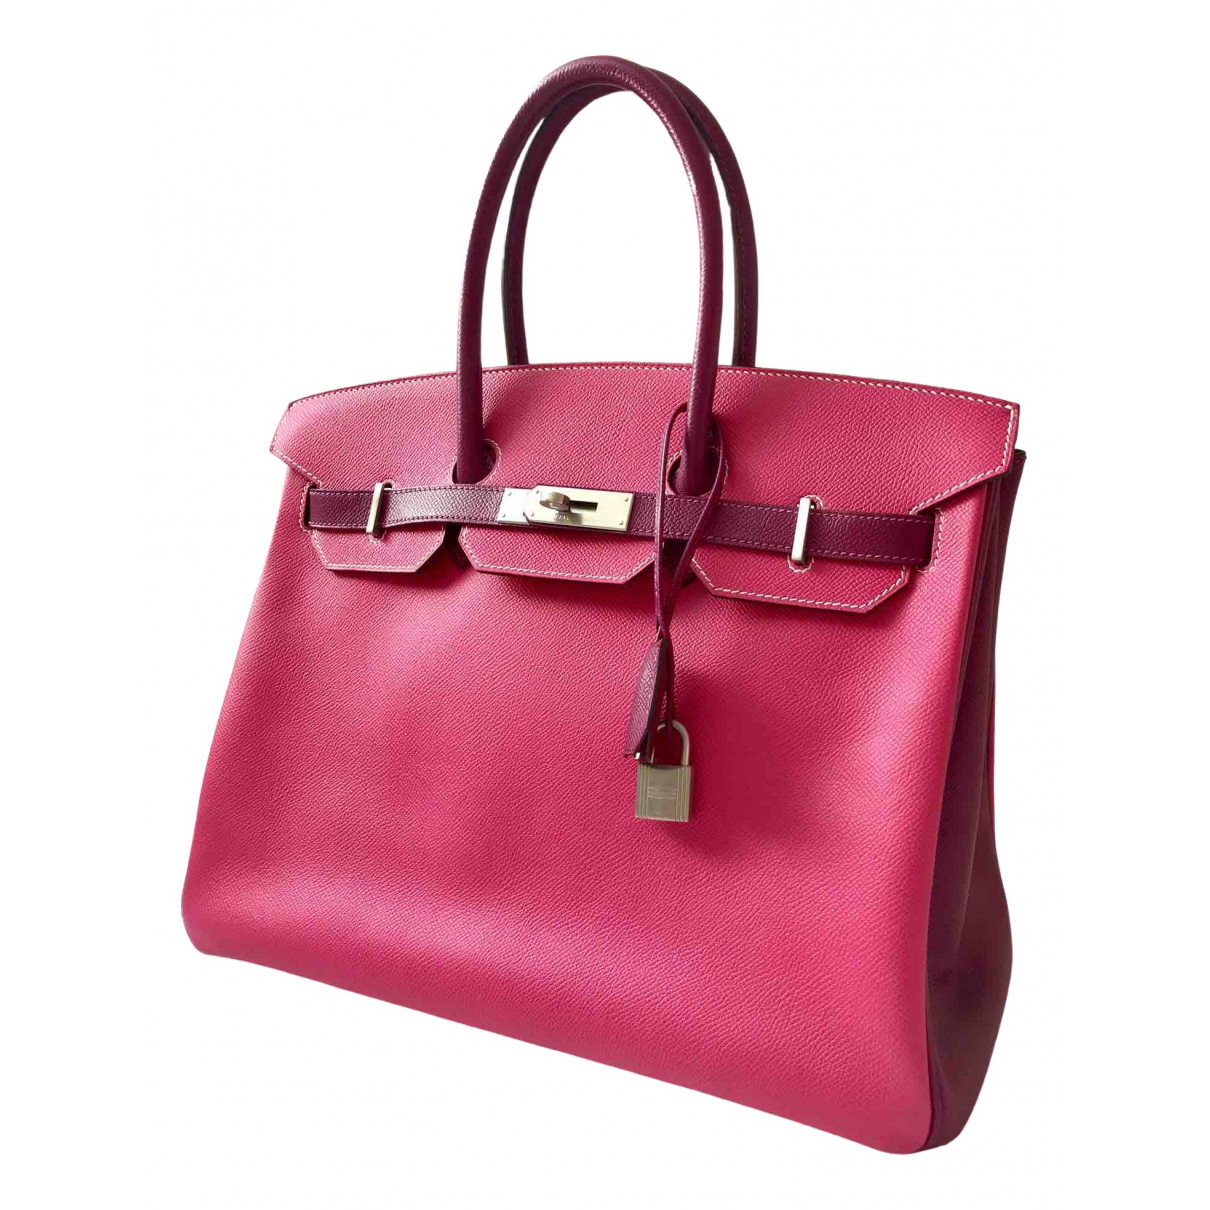 Hermes - Sac a main Birkin 35 pour femme en cuir - rose